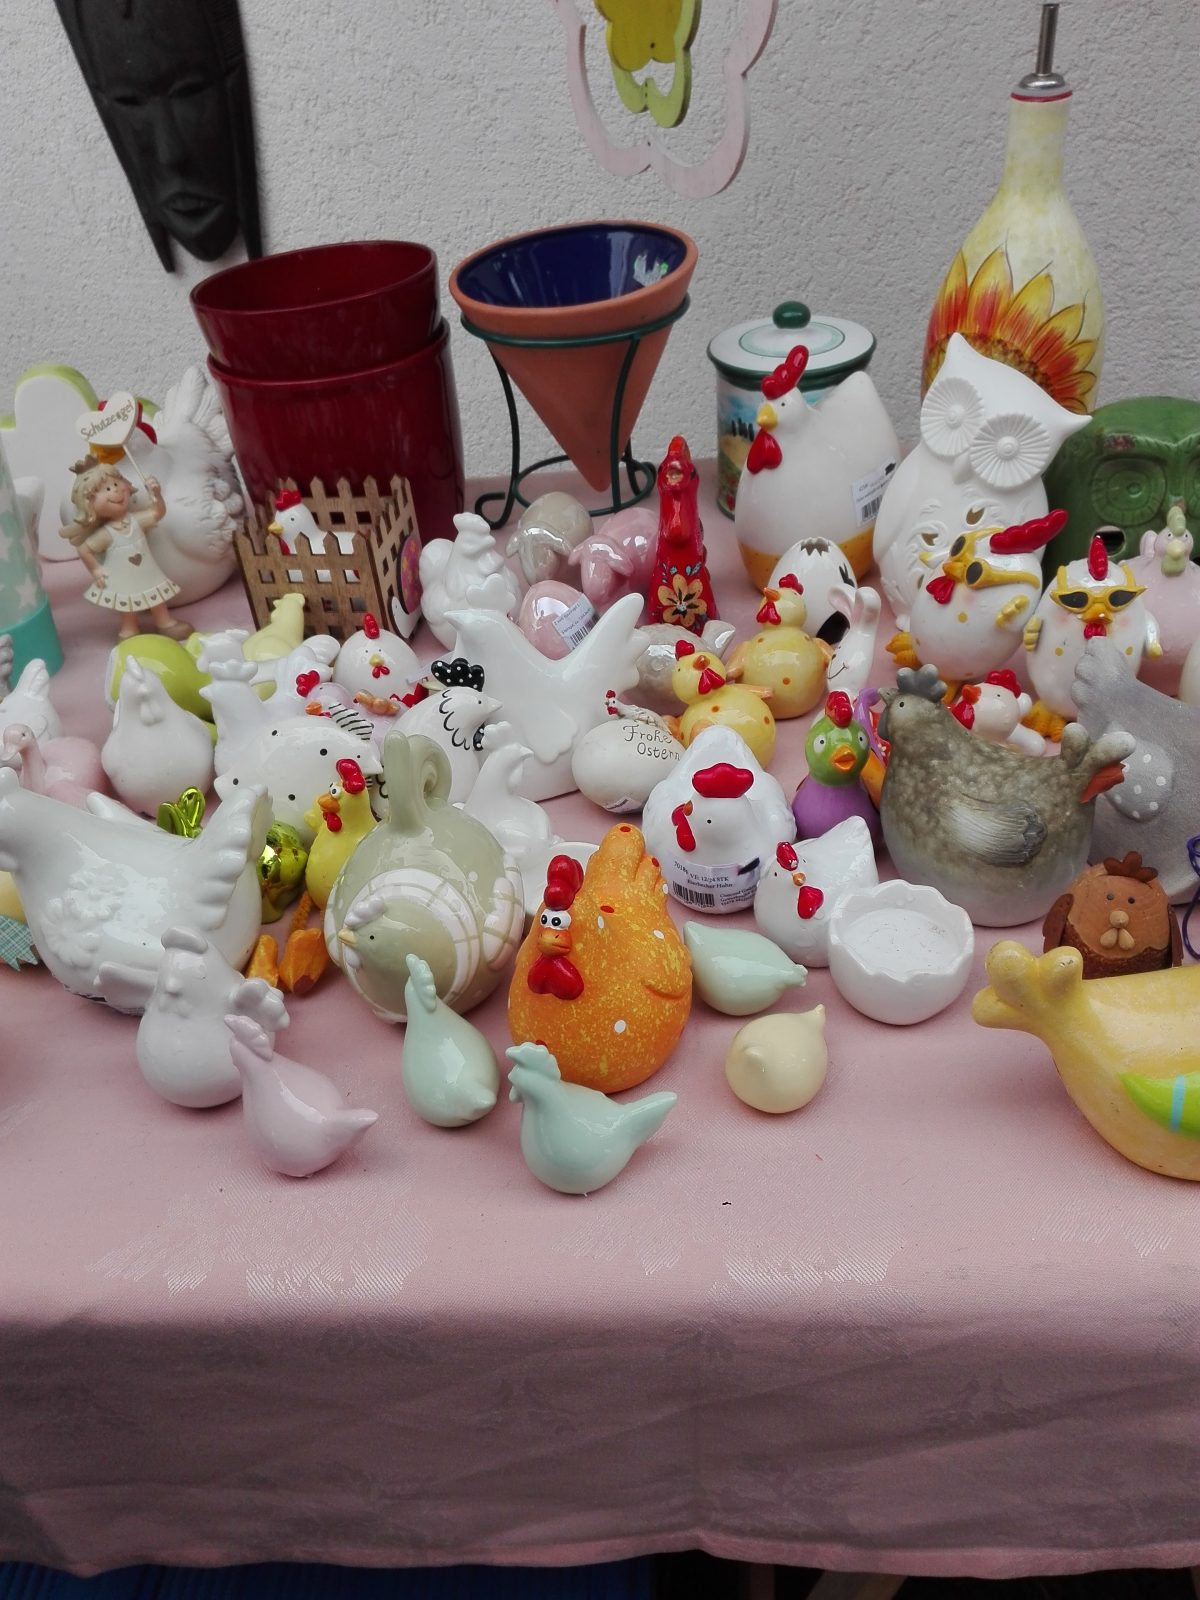 Frühlingsmarkt der KatzenHilfe Karlsruhe | chilibluetendotcom